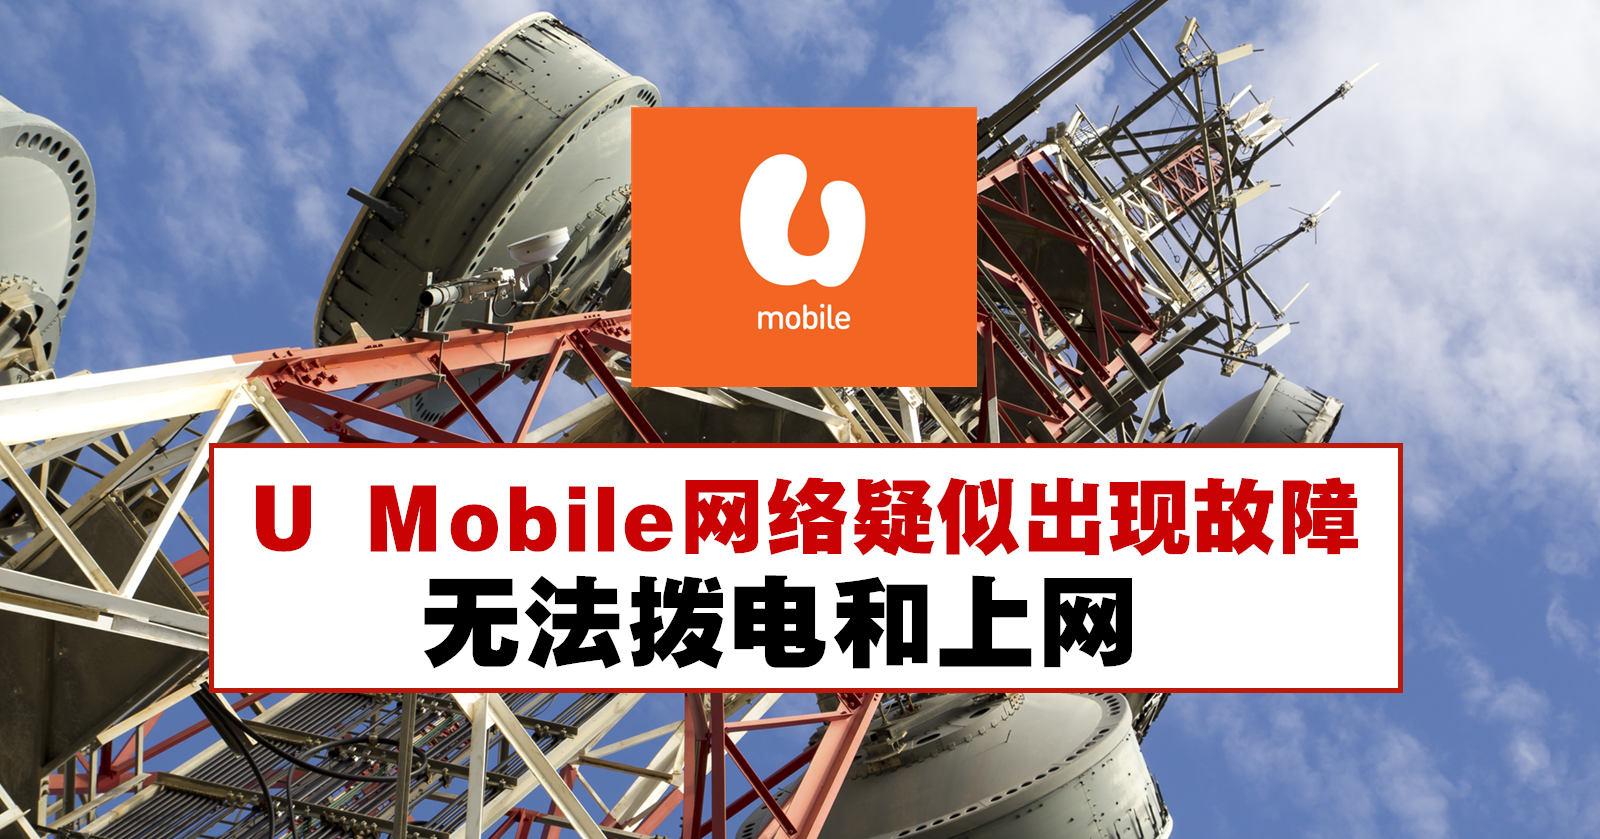 U Mobile网络疑似出现故障,无法拨电和上网